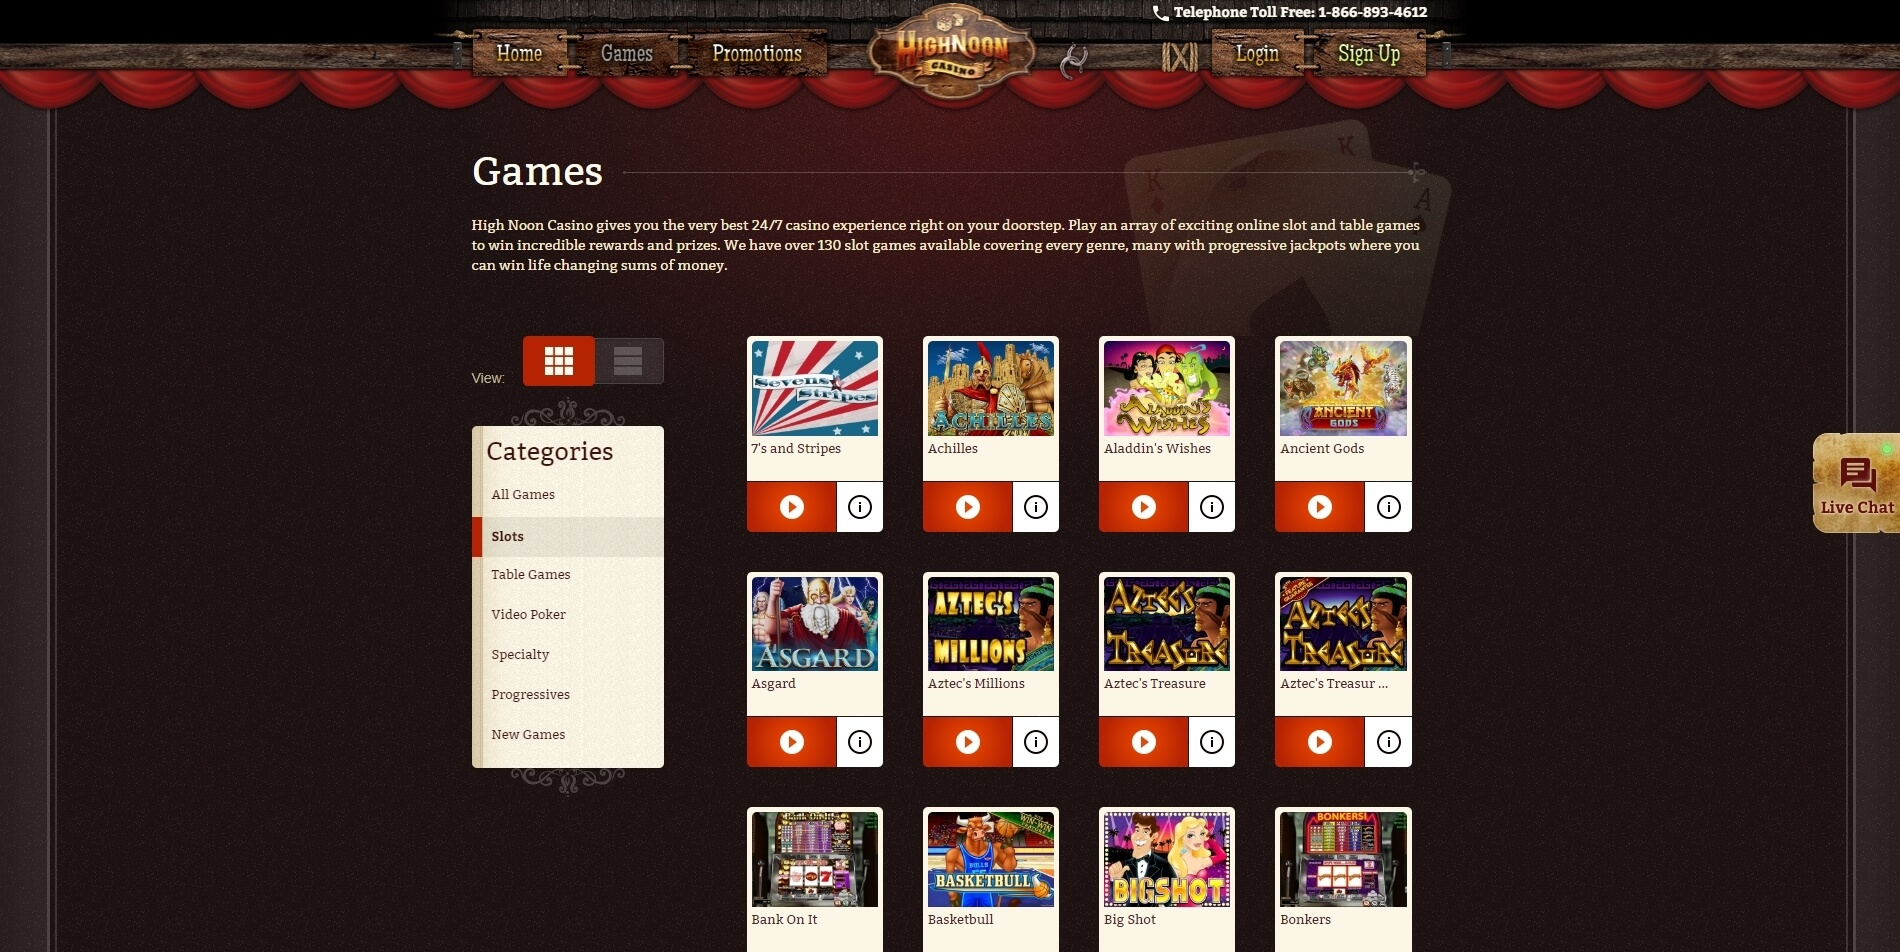 highnoon casino slots